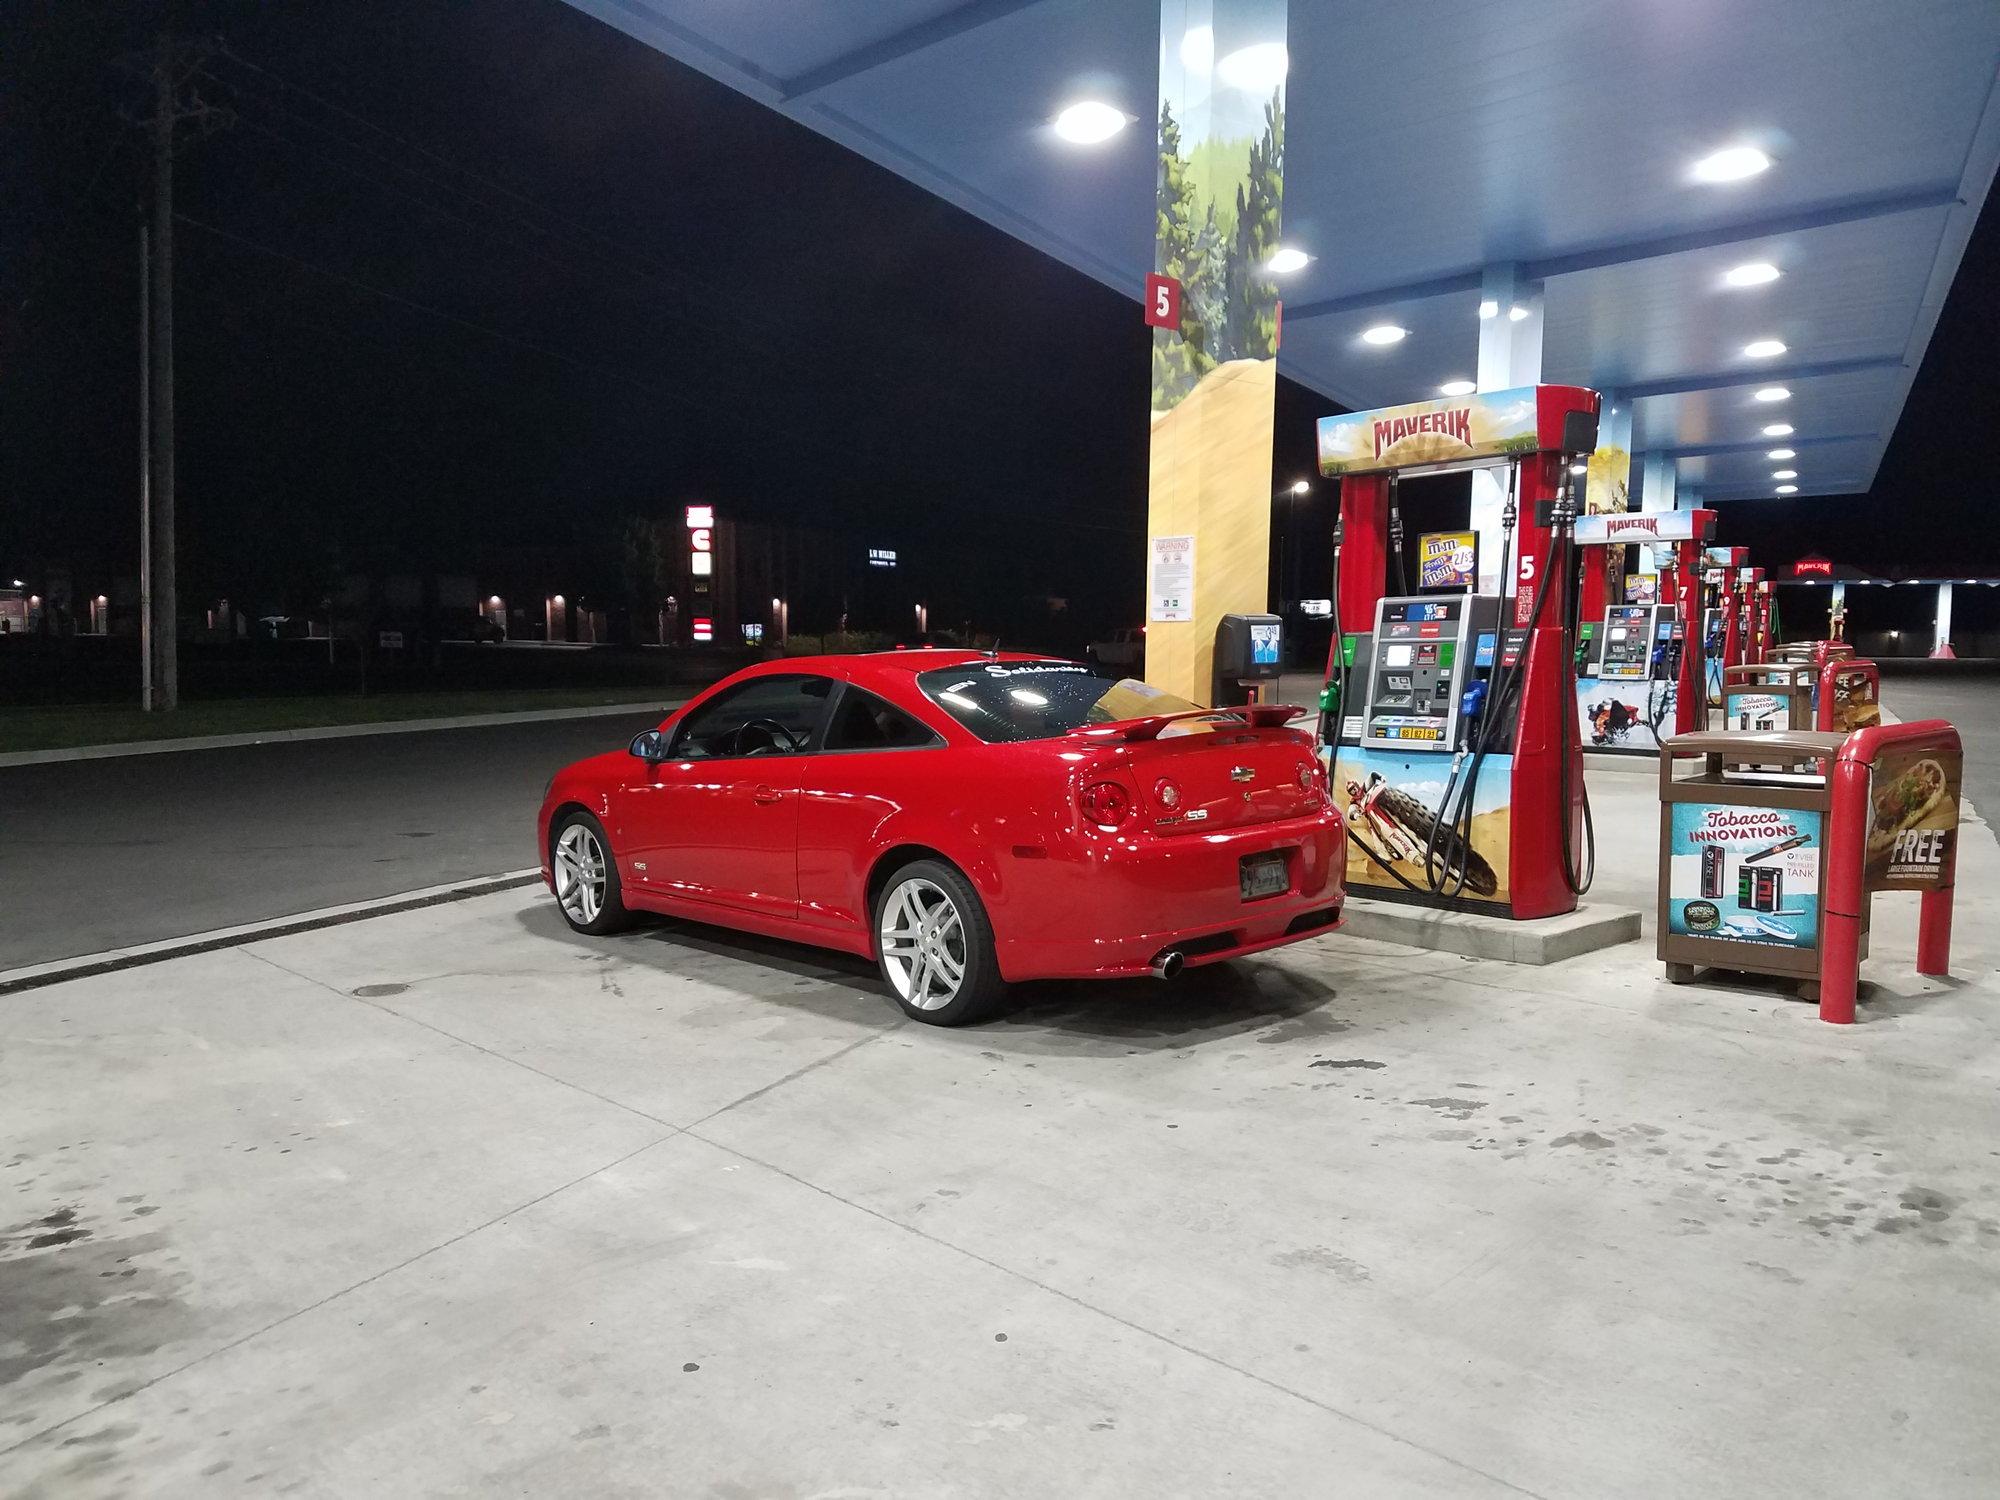 2008 Chevy Cobalt Ss Tc